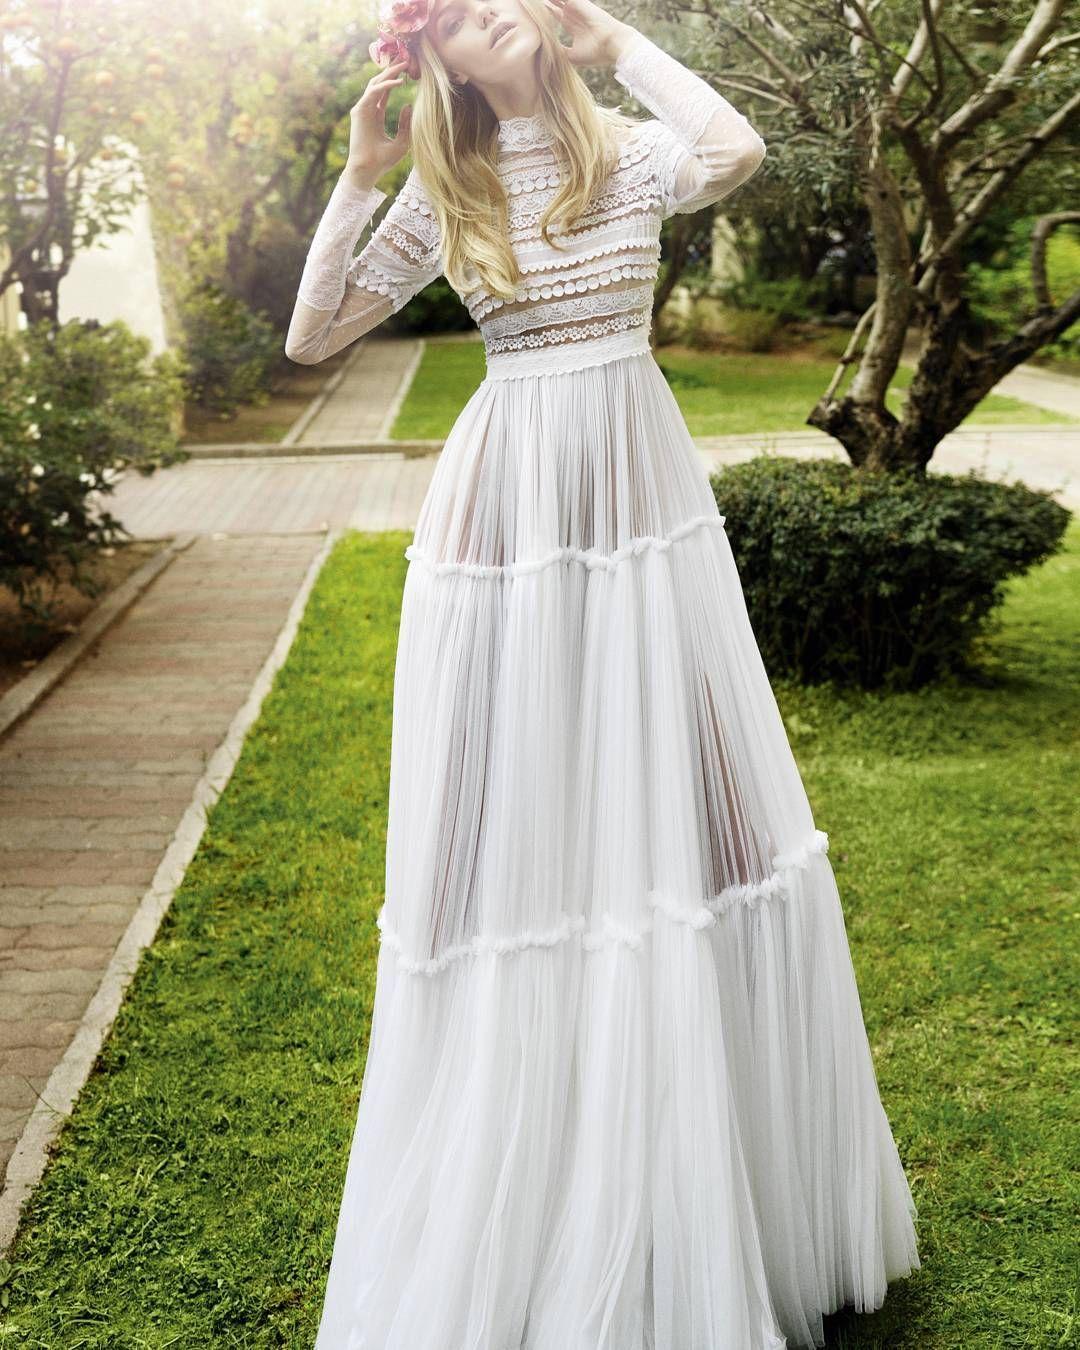 Costarellosu trademark costarellosbride brides weddingdress